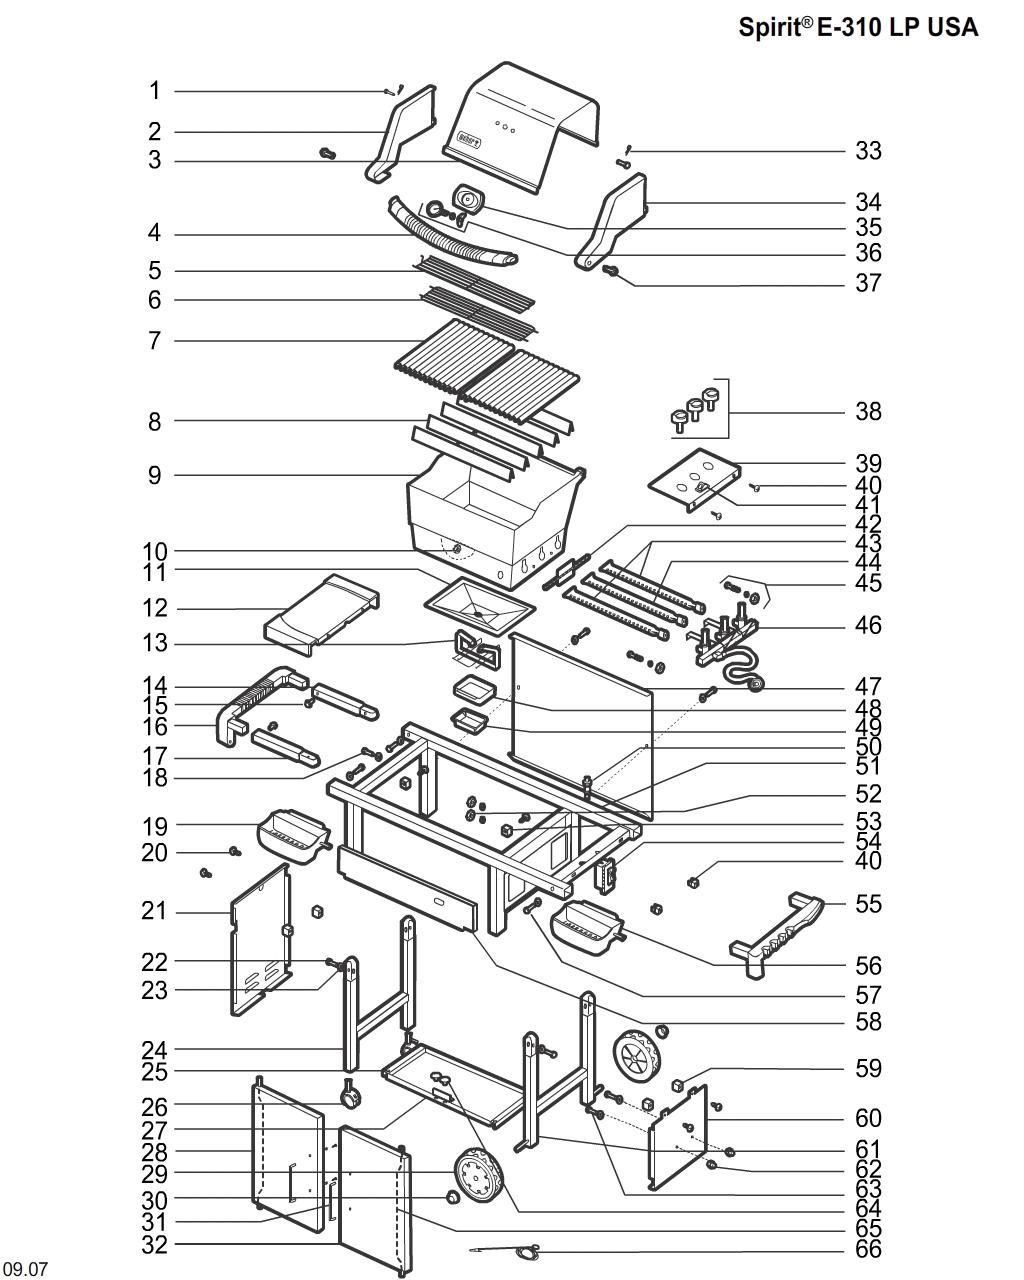 Schematic Image 3721001